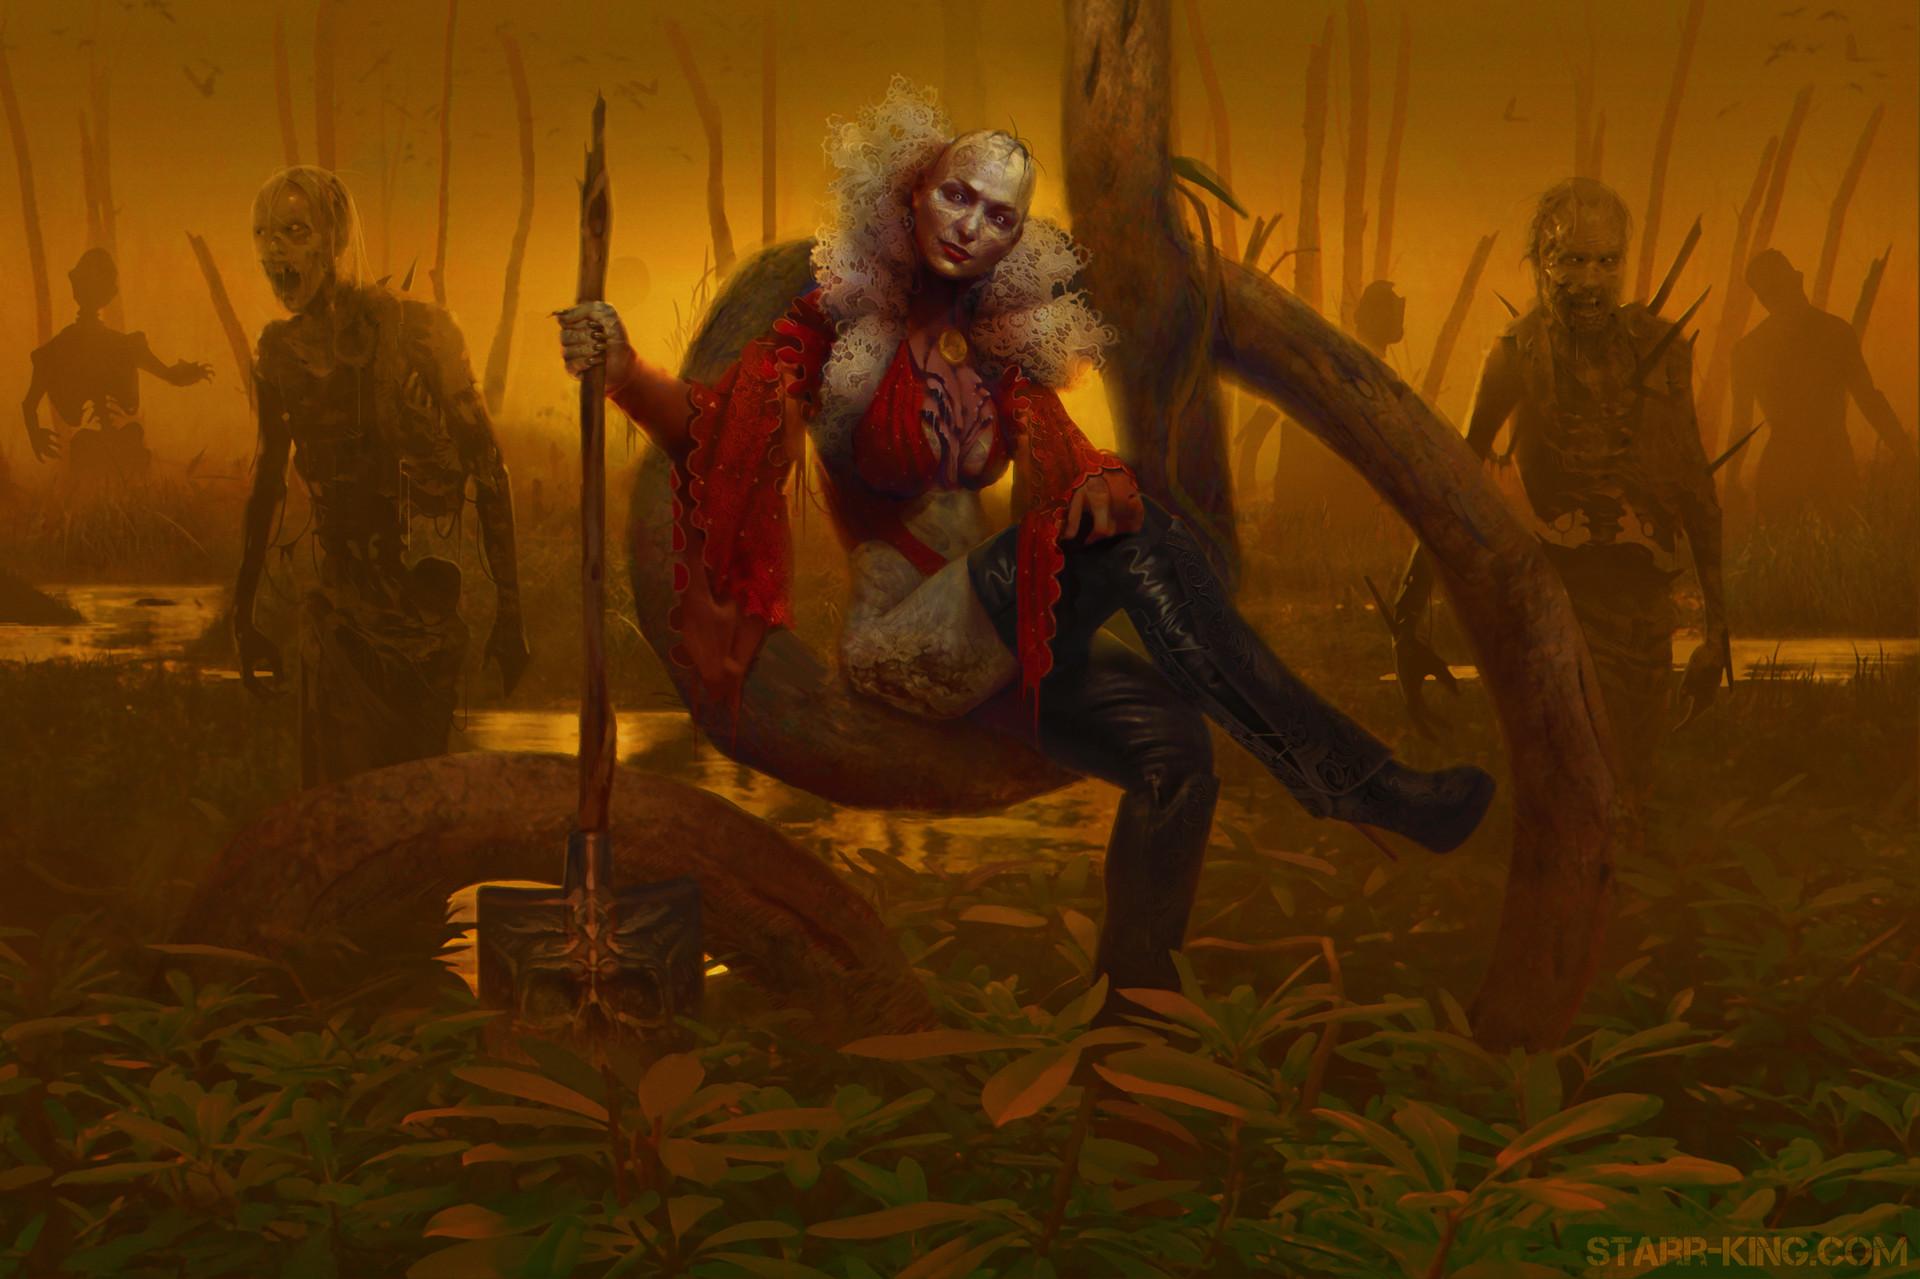 James starr king starr king zombie queen